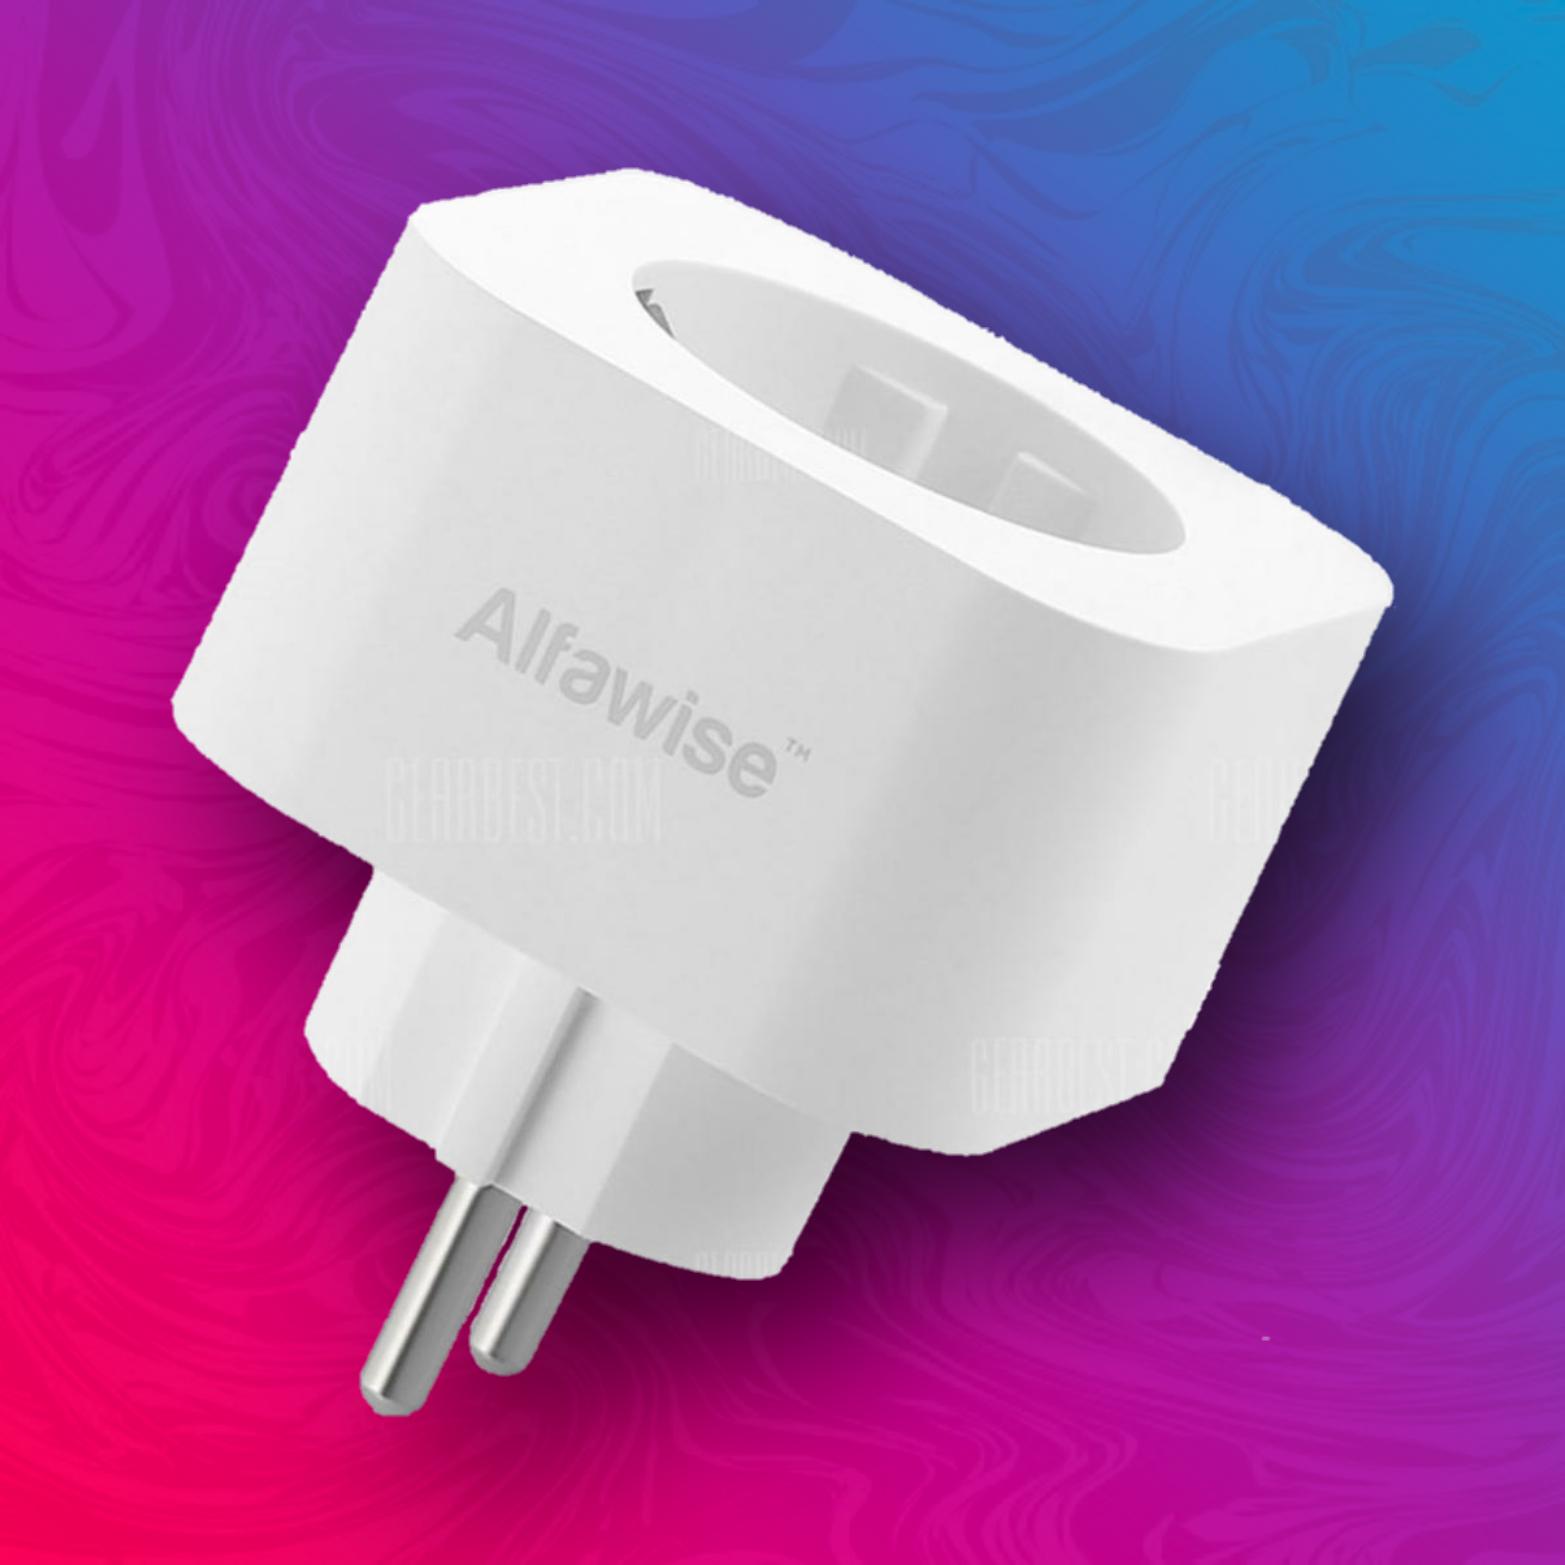 Alfawise PE1004T - EU Steckdose - Alexa // Google Home // Tuya Smart - Timer